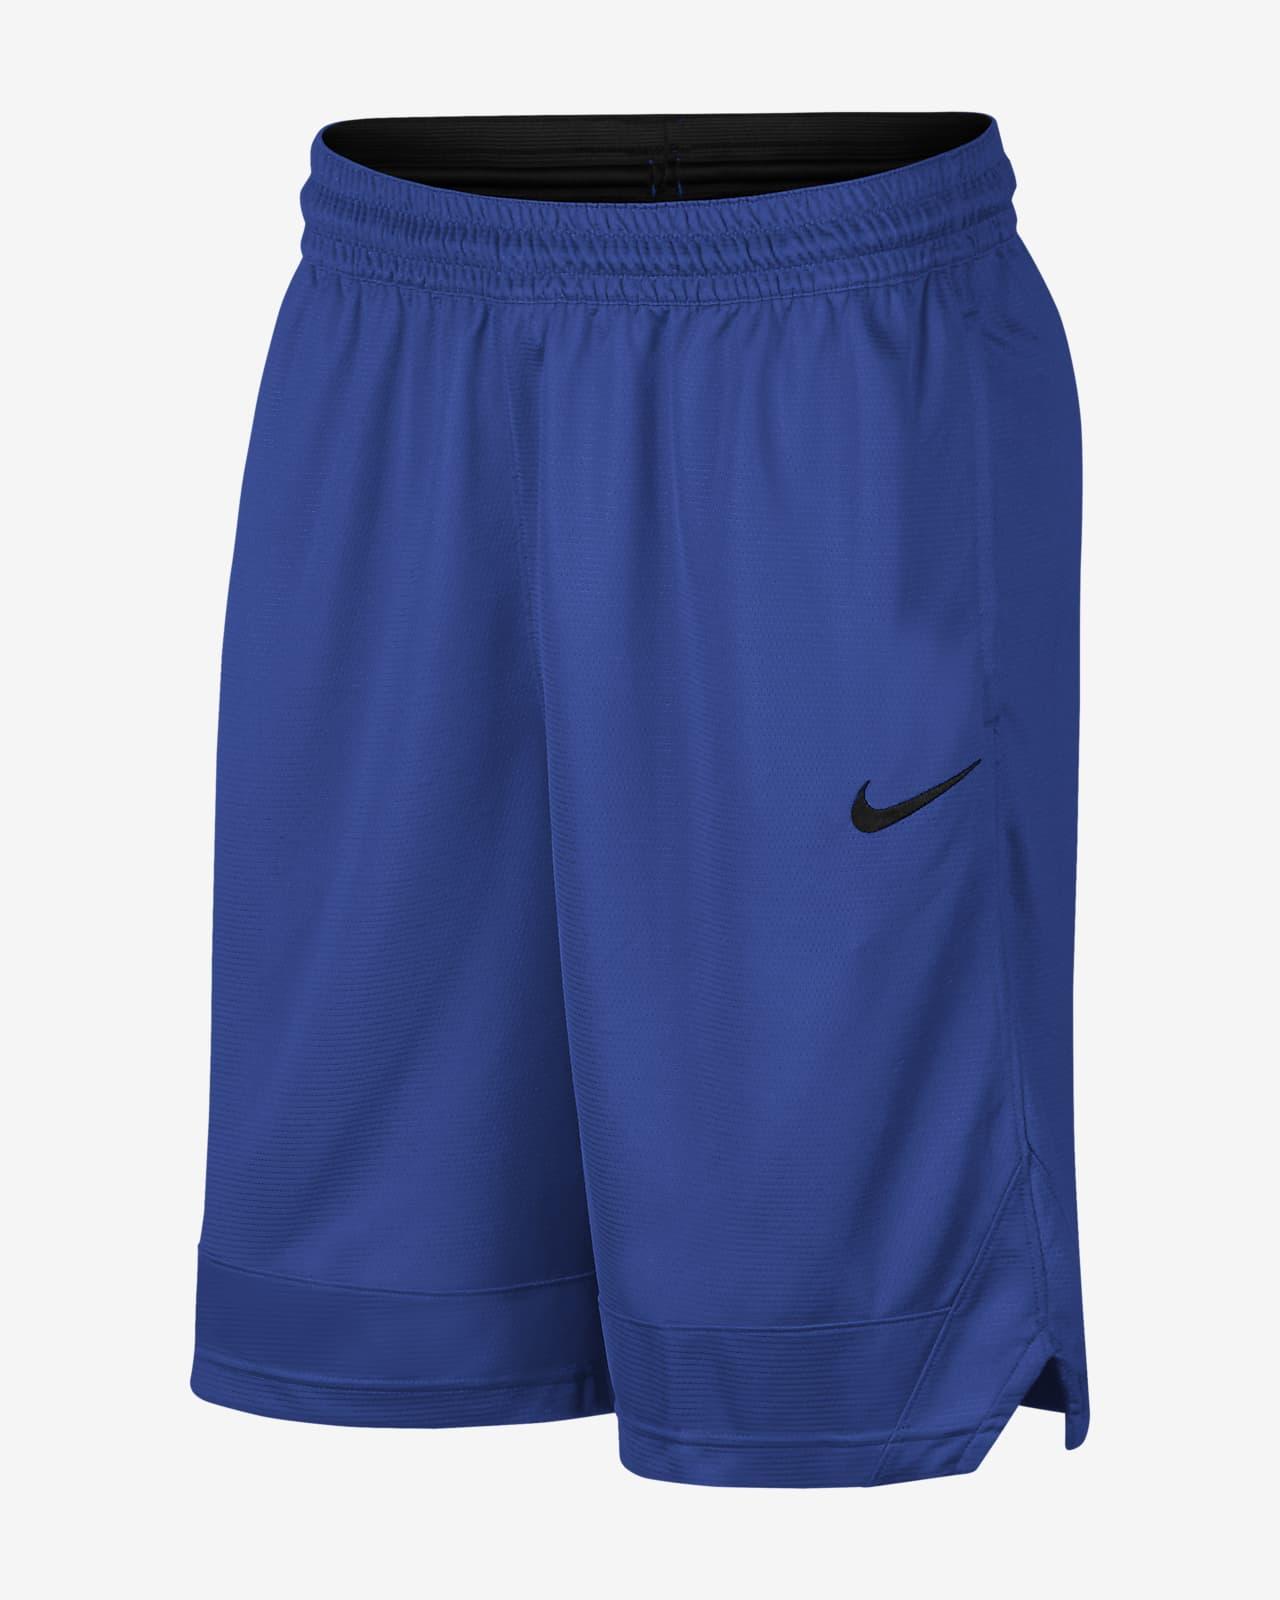 Nike Dri-FIT Icon Men's Basketball Shorts